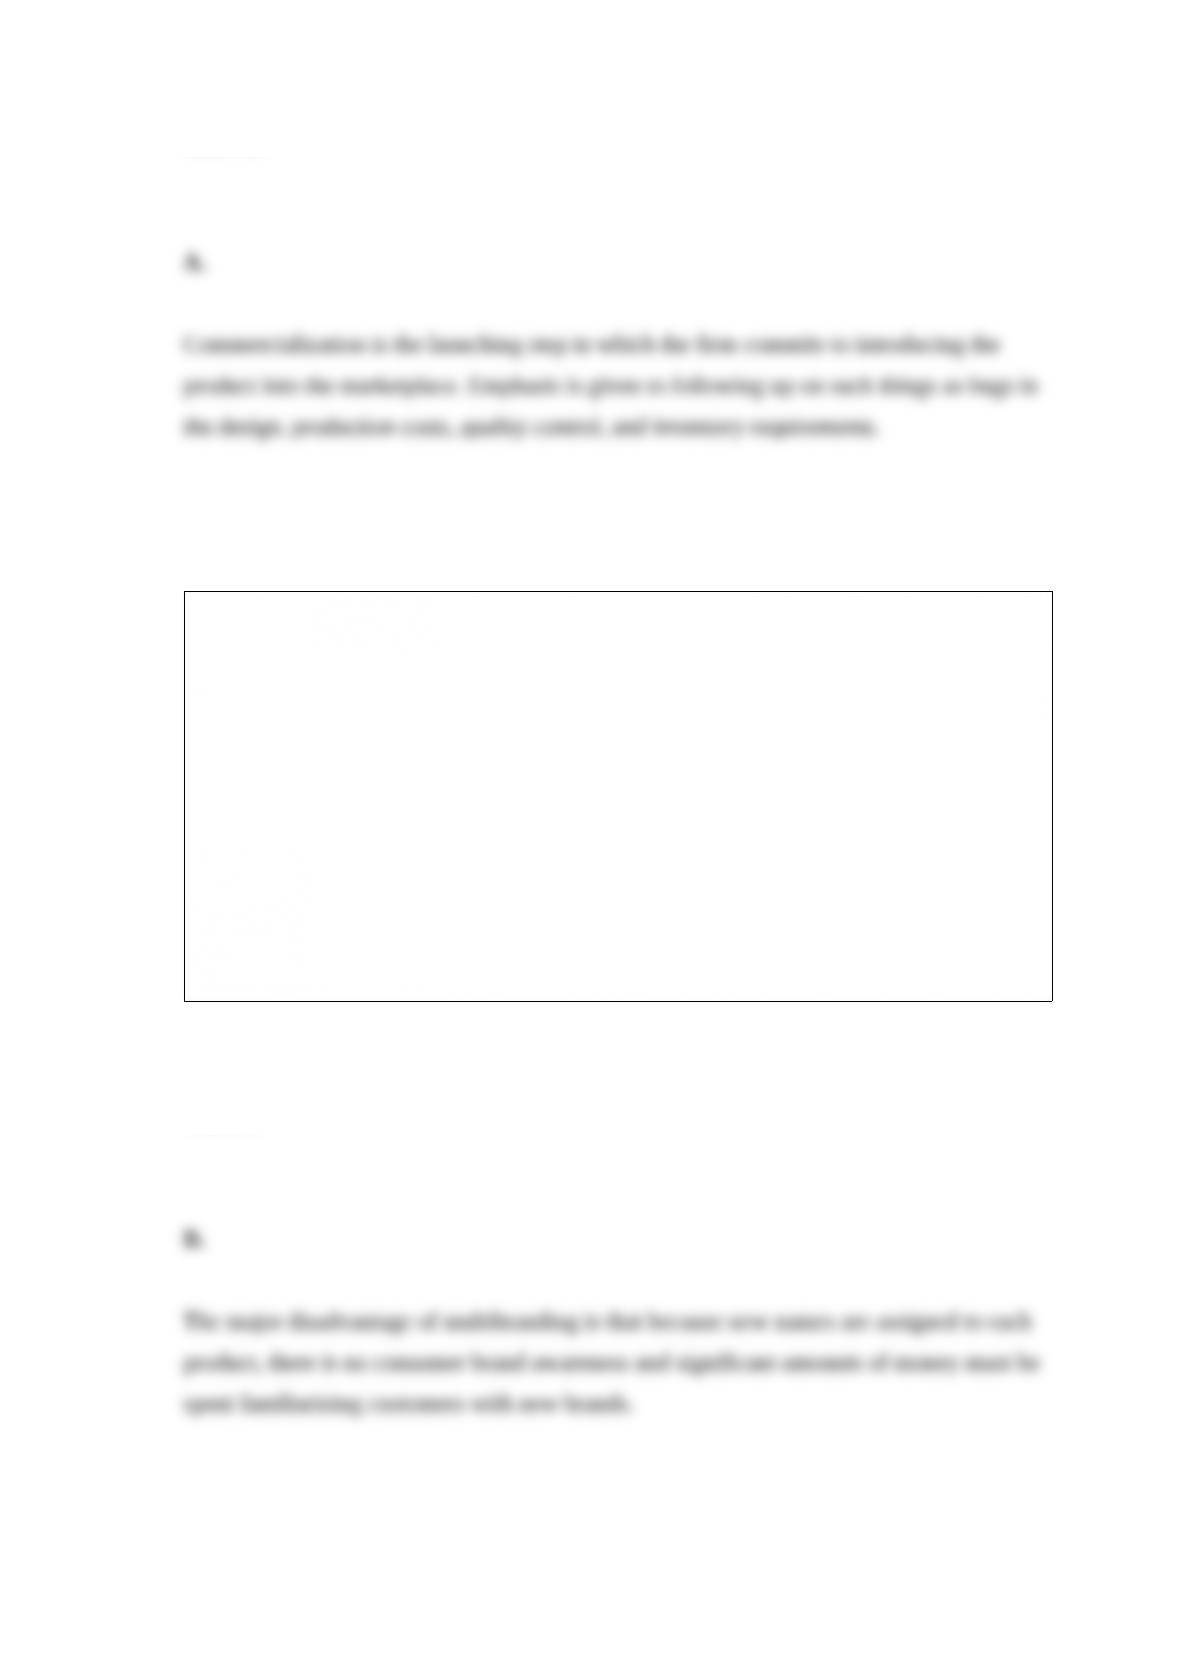 CE 625 Quiz 2 | Get 24/7 Homework Help | Online Study ...